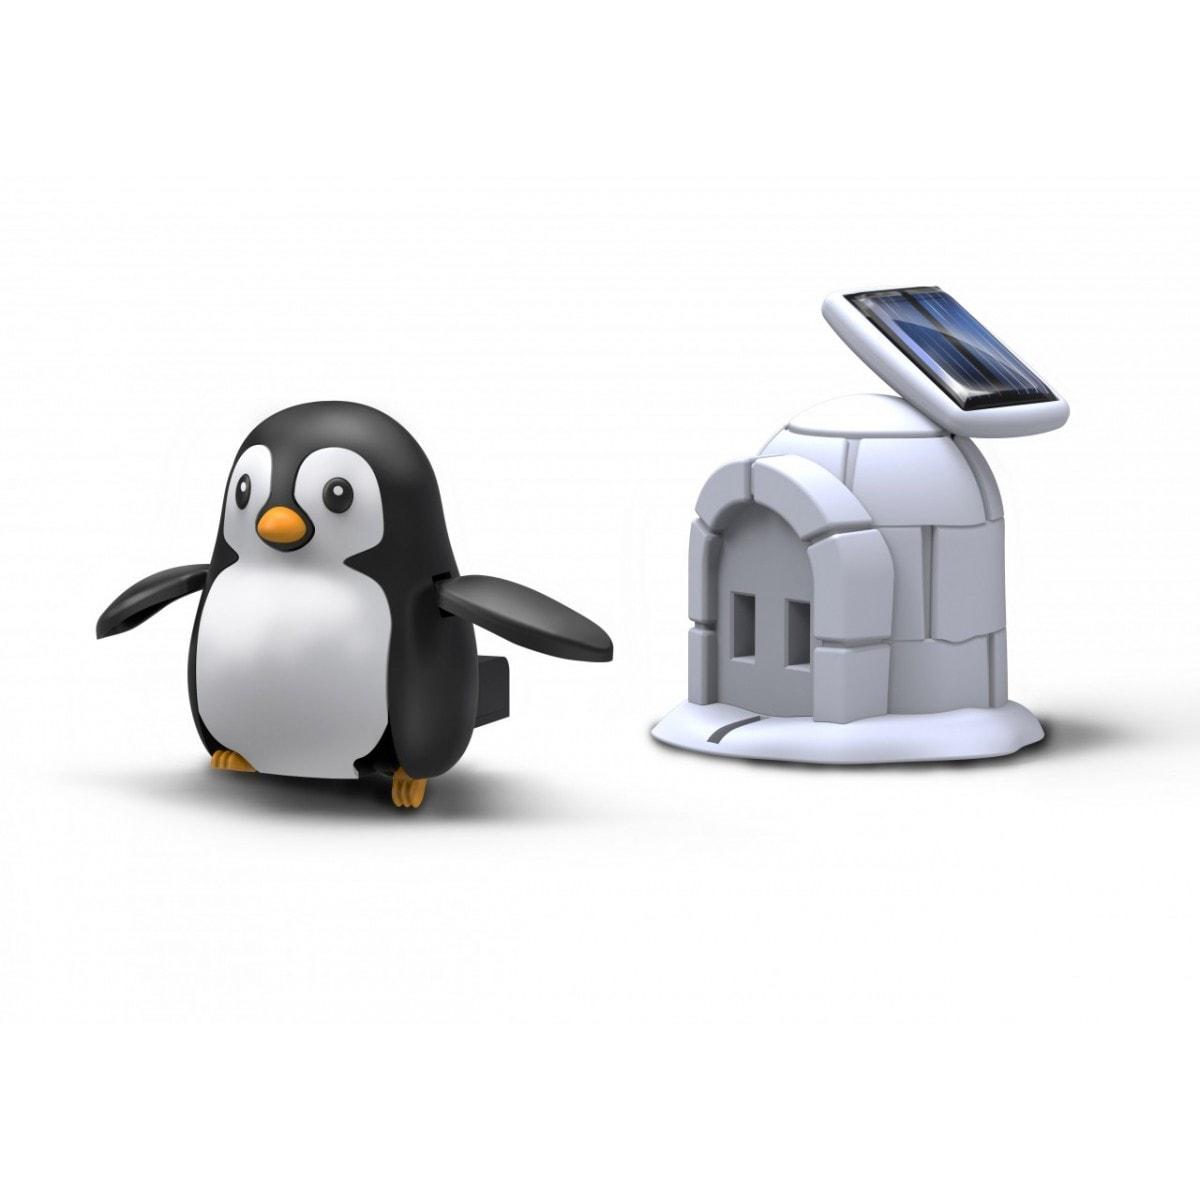 Конструктор на солнечной батарее «Пингвин» Bradex